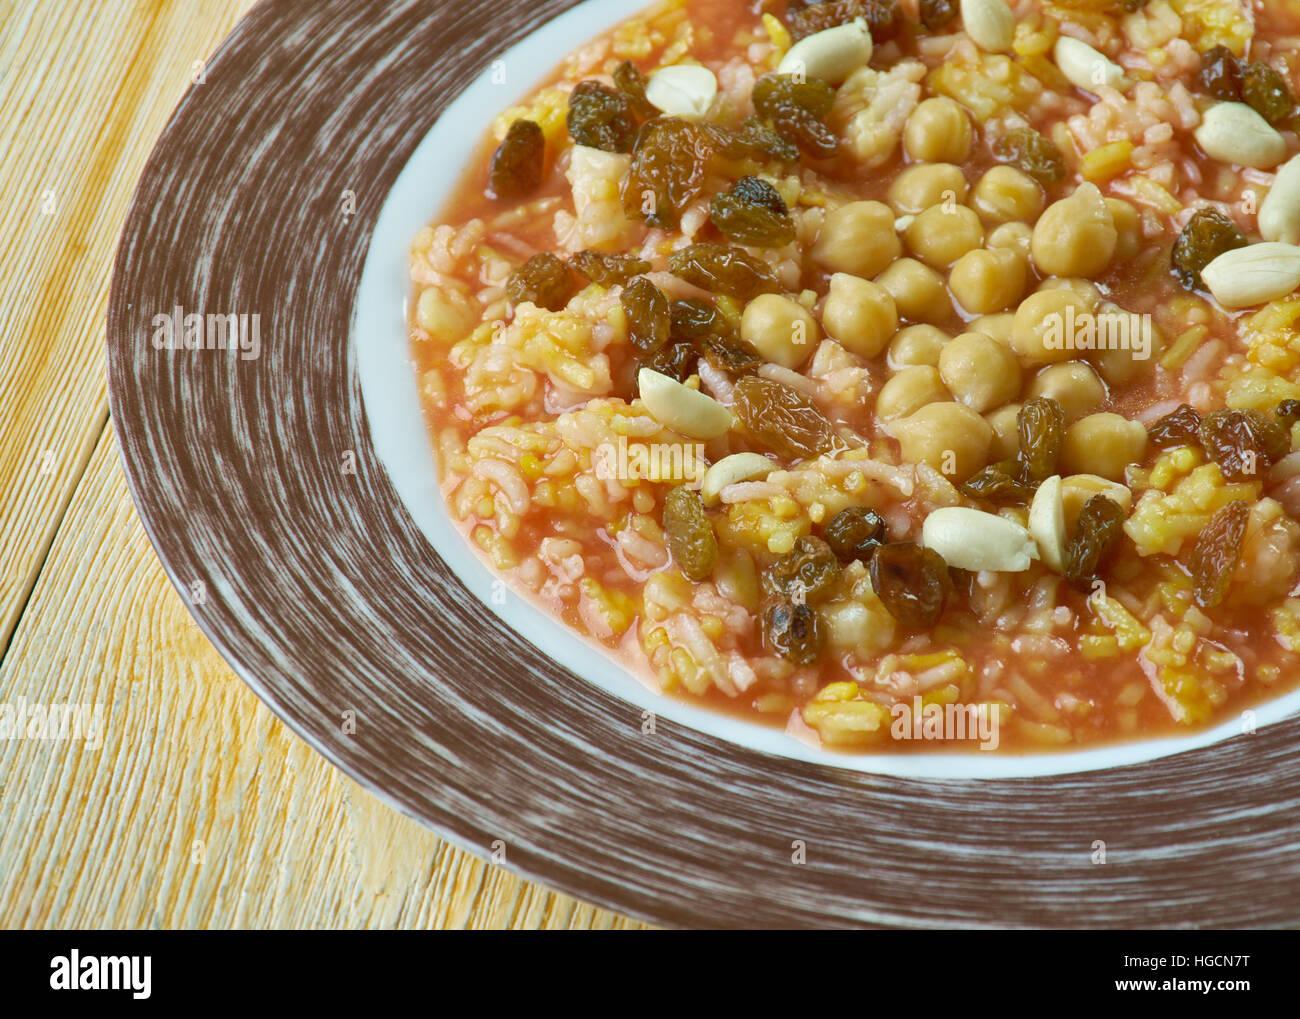 Egyptian rice with nuts and raisins: Ruz bil khalta - Stock Image